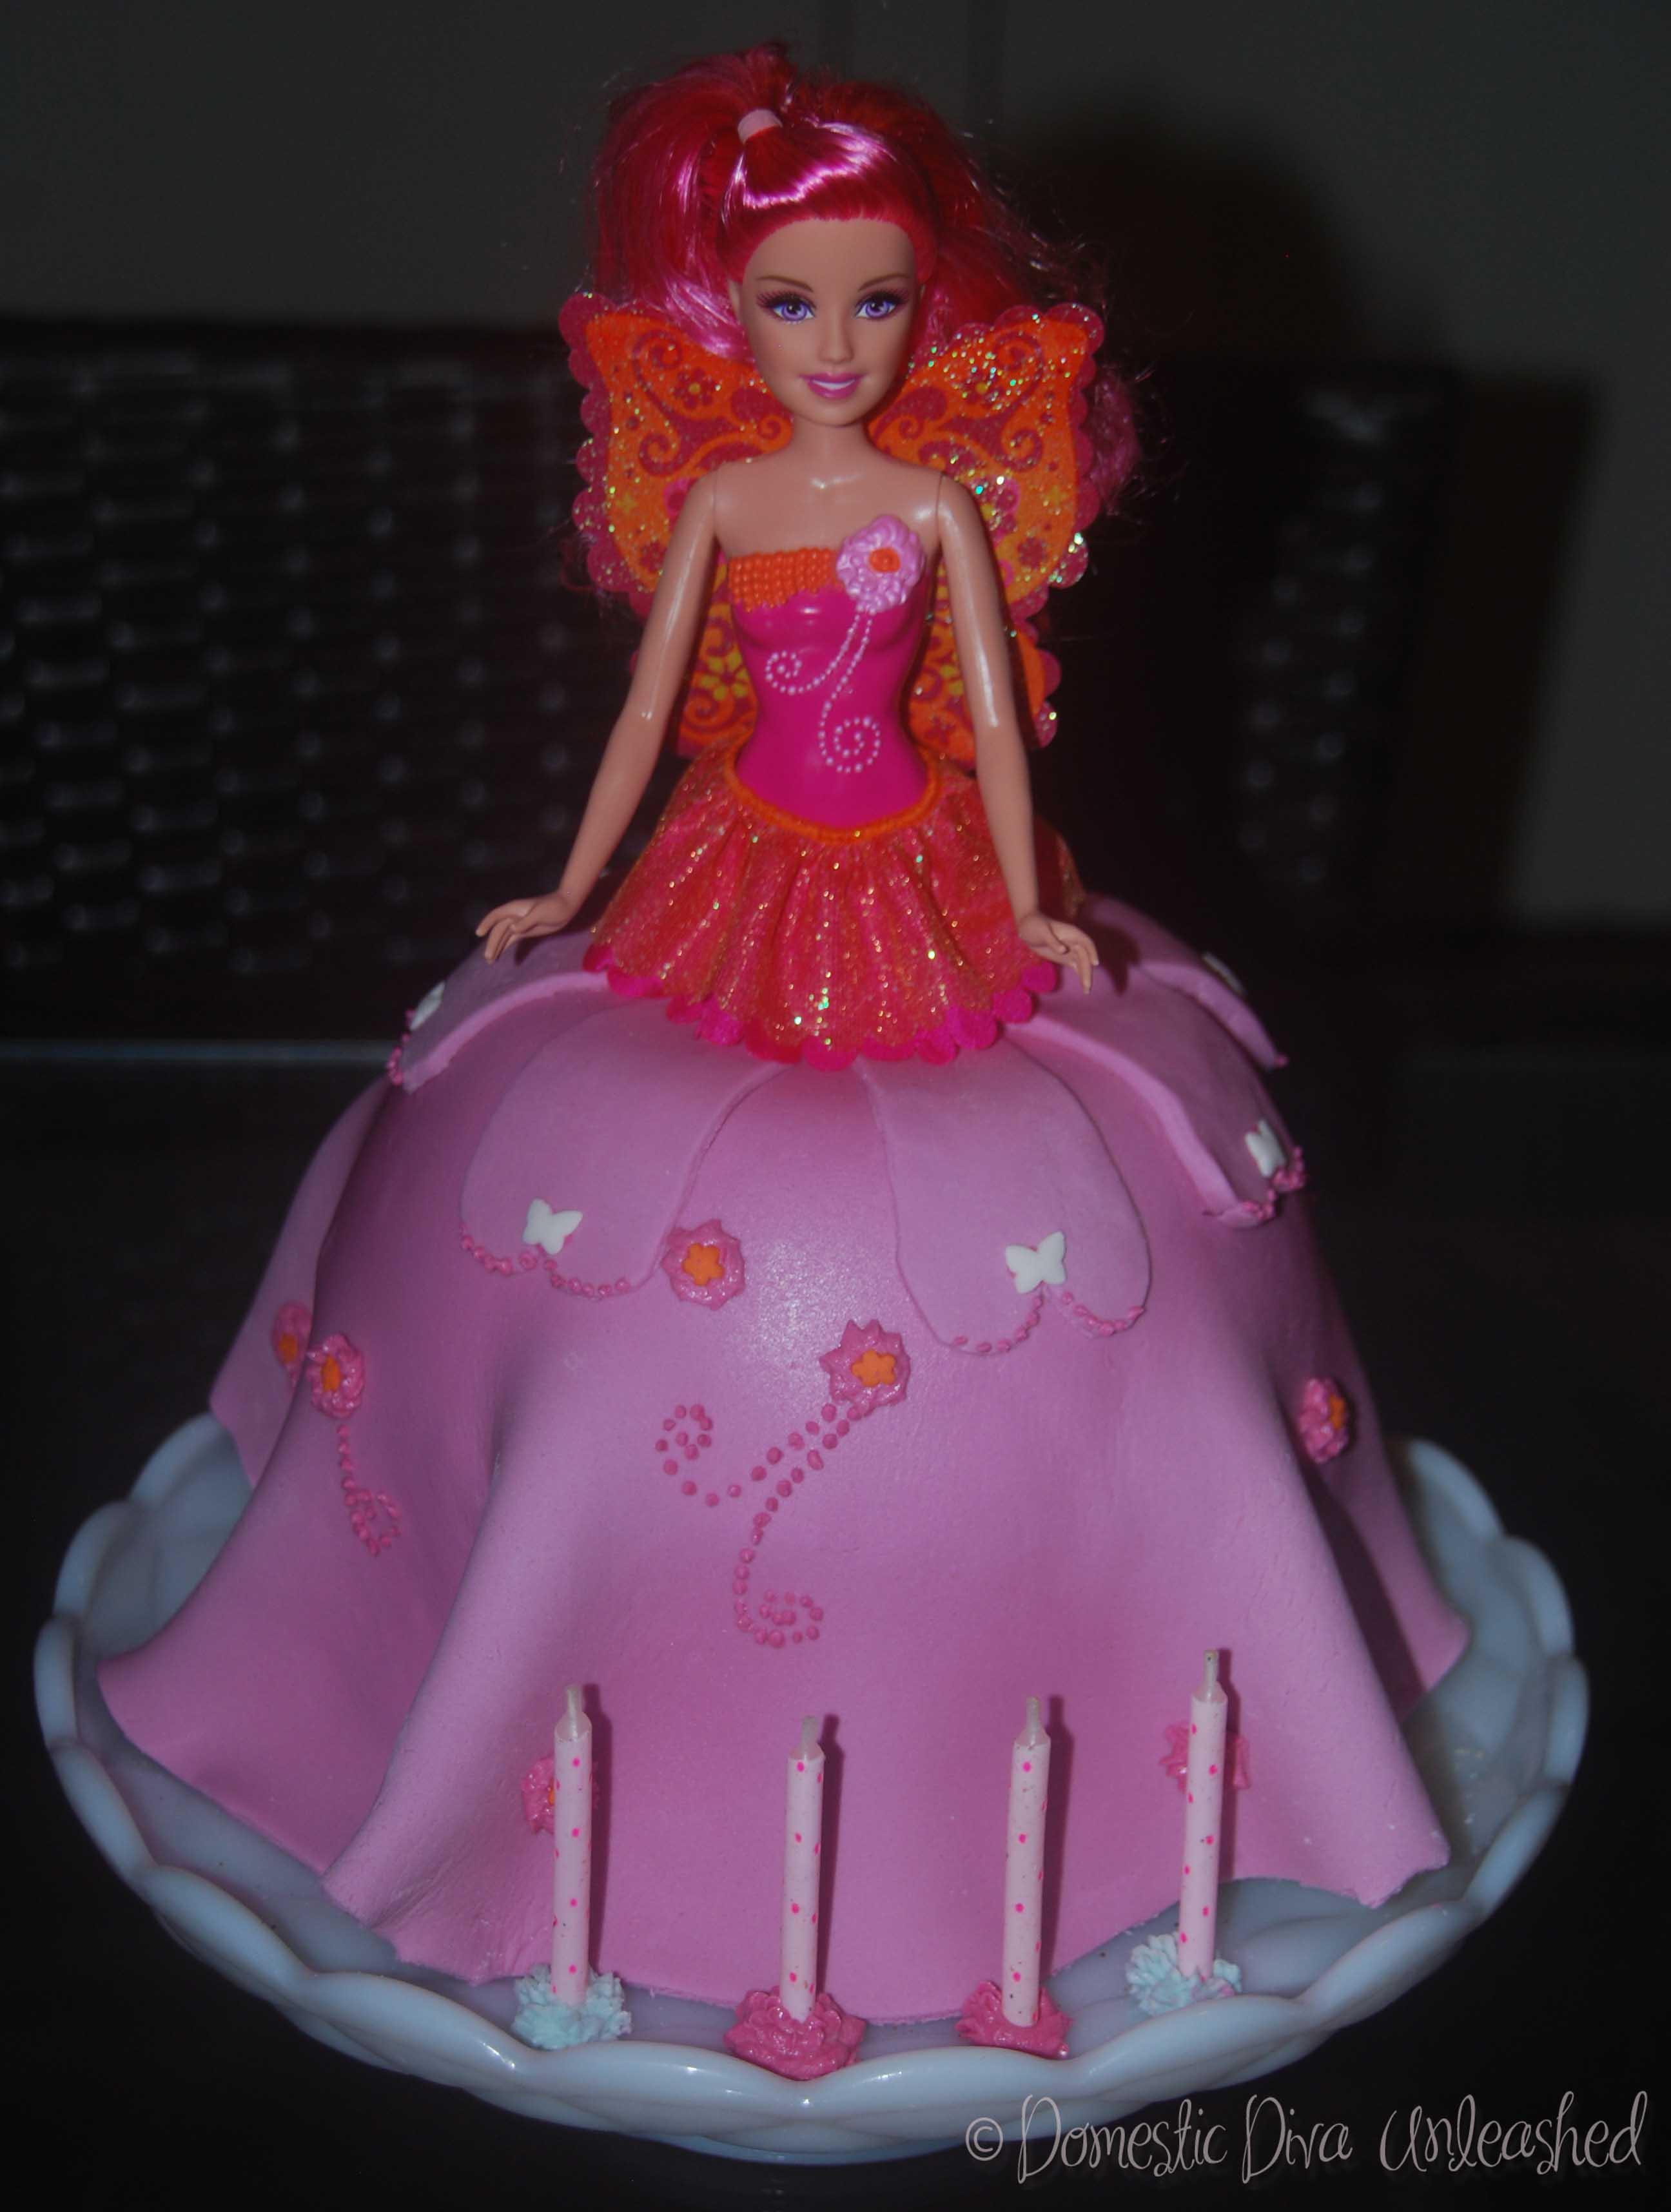 Domestic Diva Caramel Mud Cake Birthday Cake Ideas